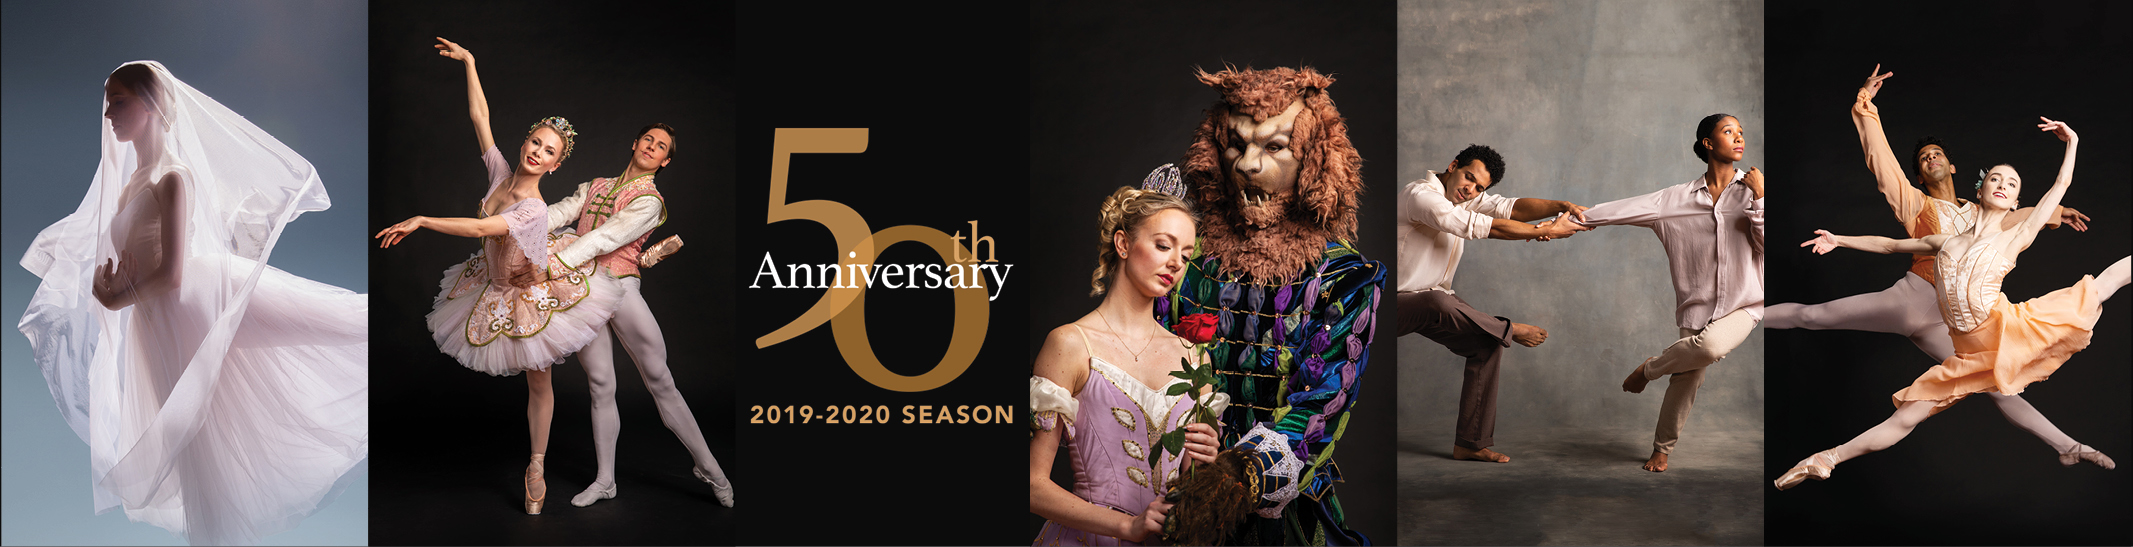 2019 2020 Season Archives Pittsburgh Ballet Theatre